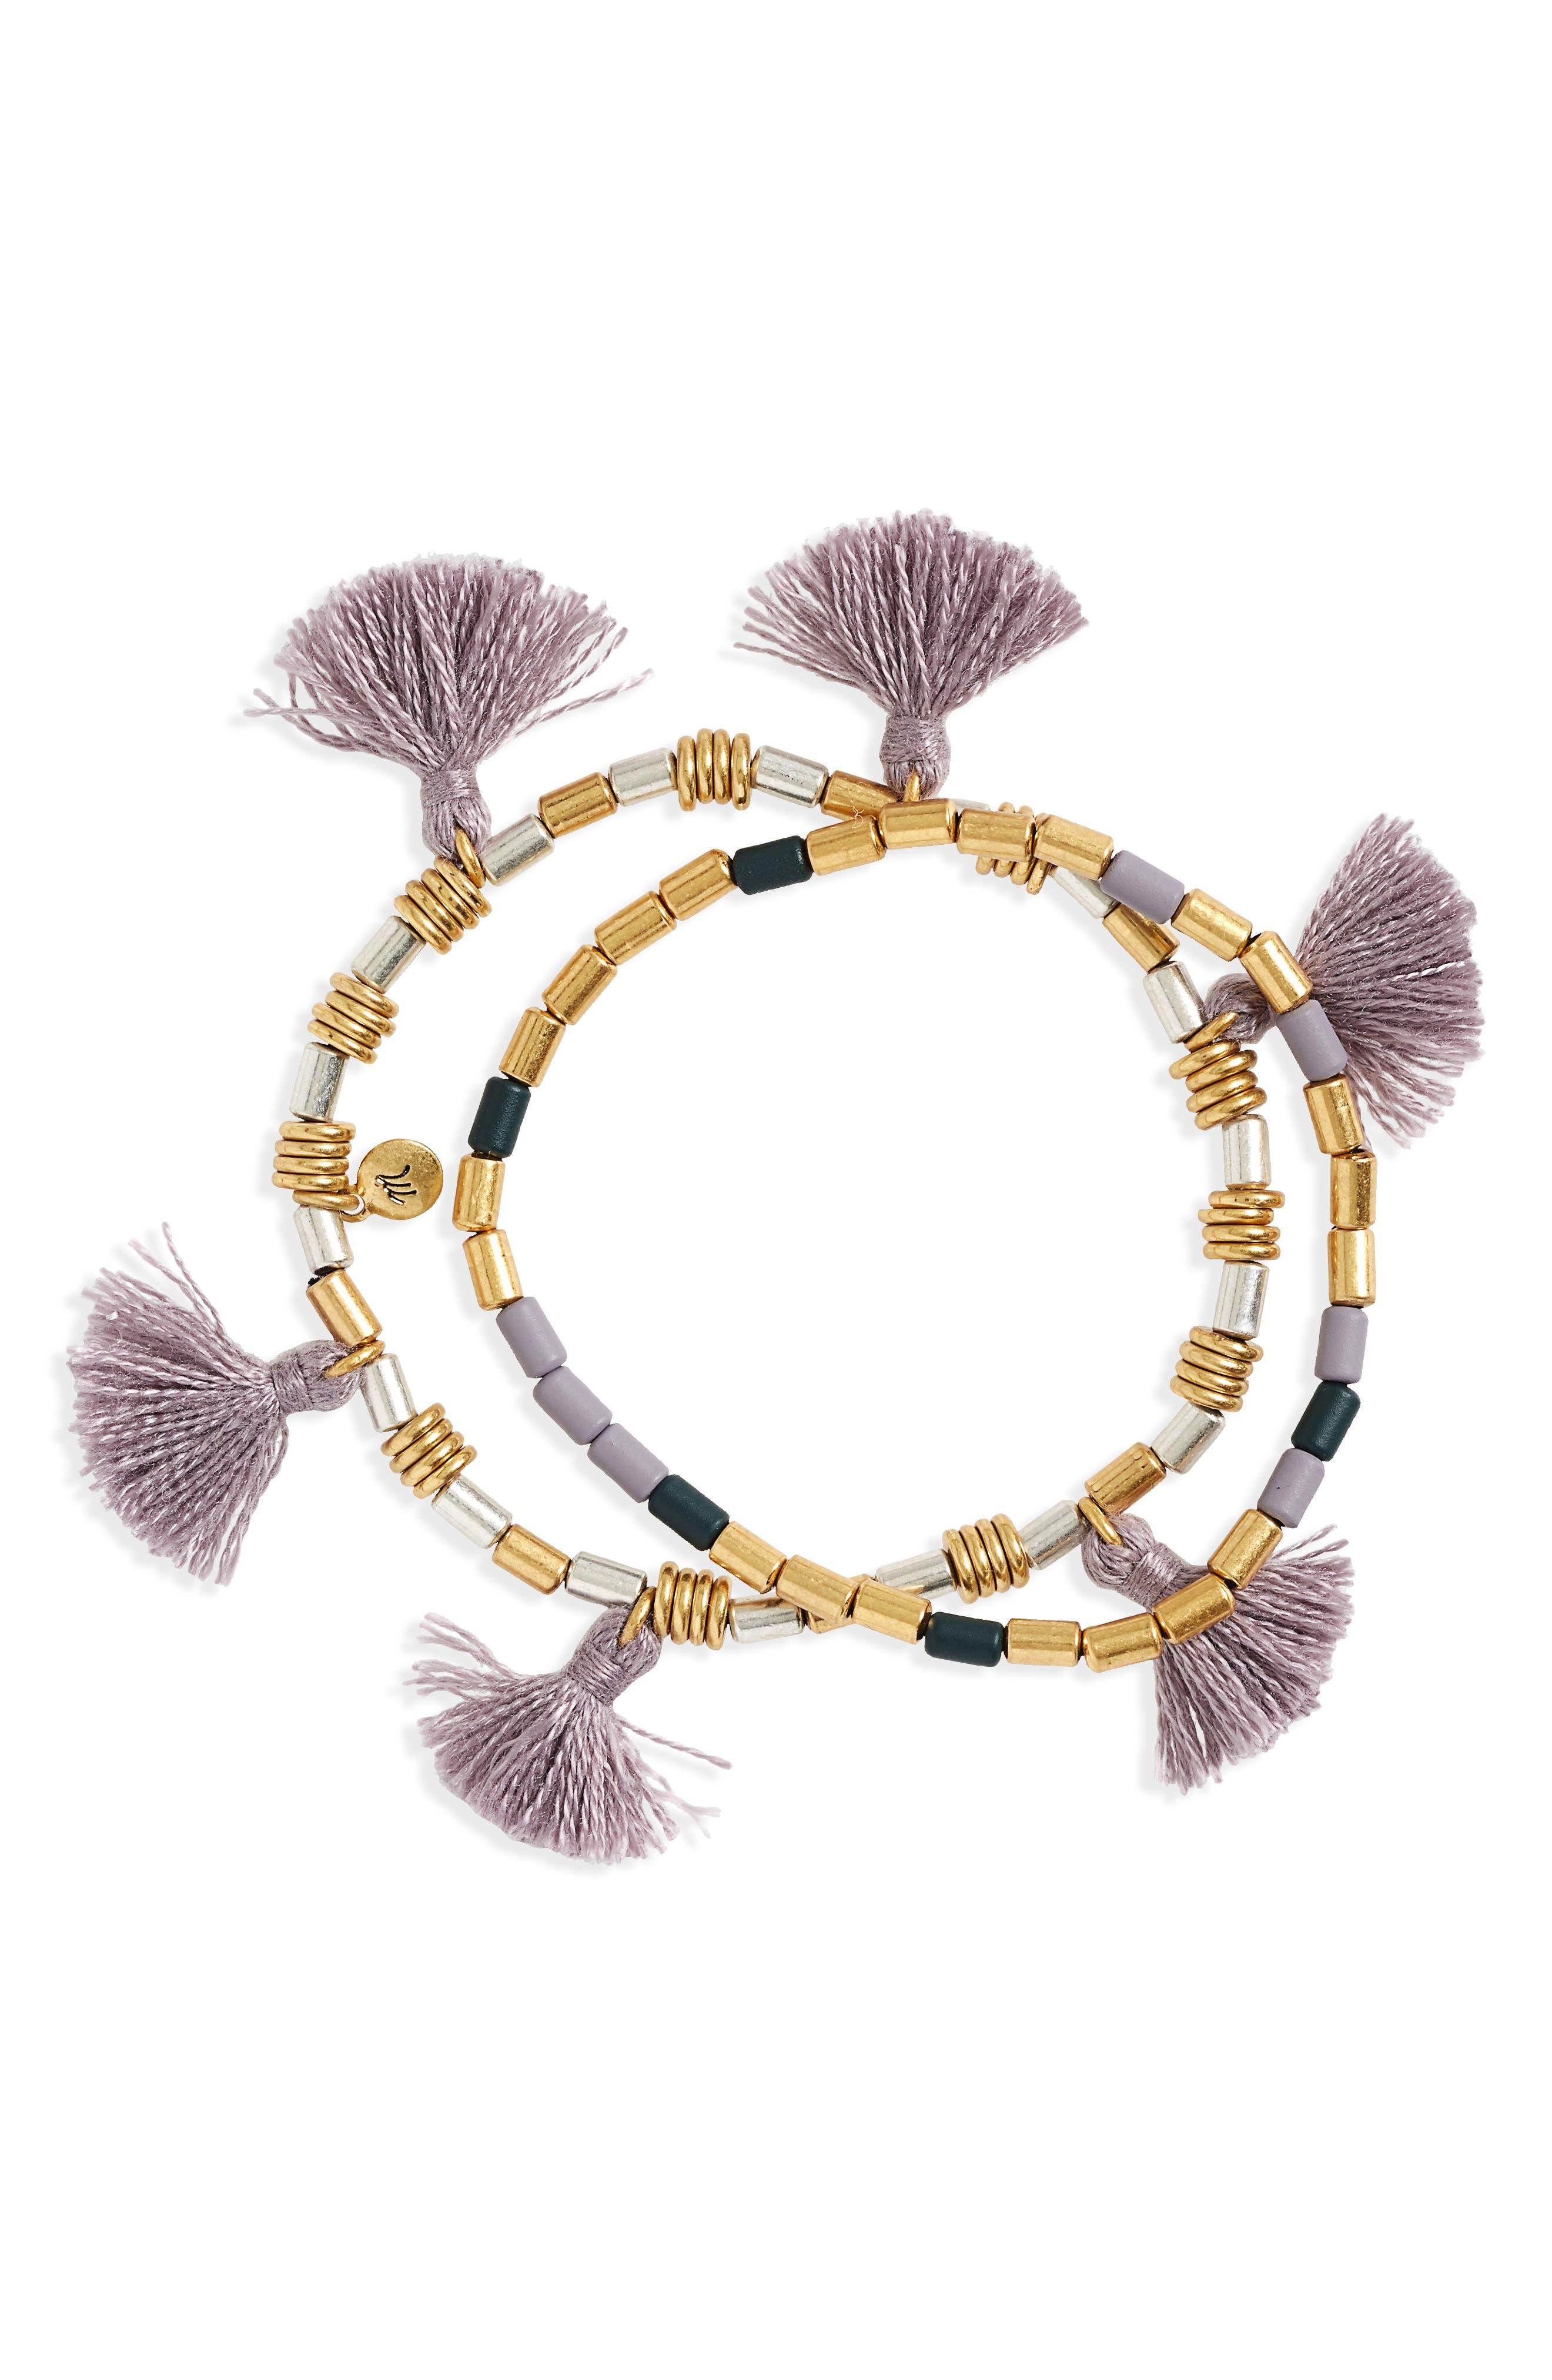 Set of 2 Beaded Tassel Bracelets,                             Main thumbnail 1, color,                             VIOLET DUSK